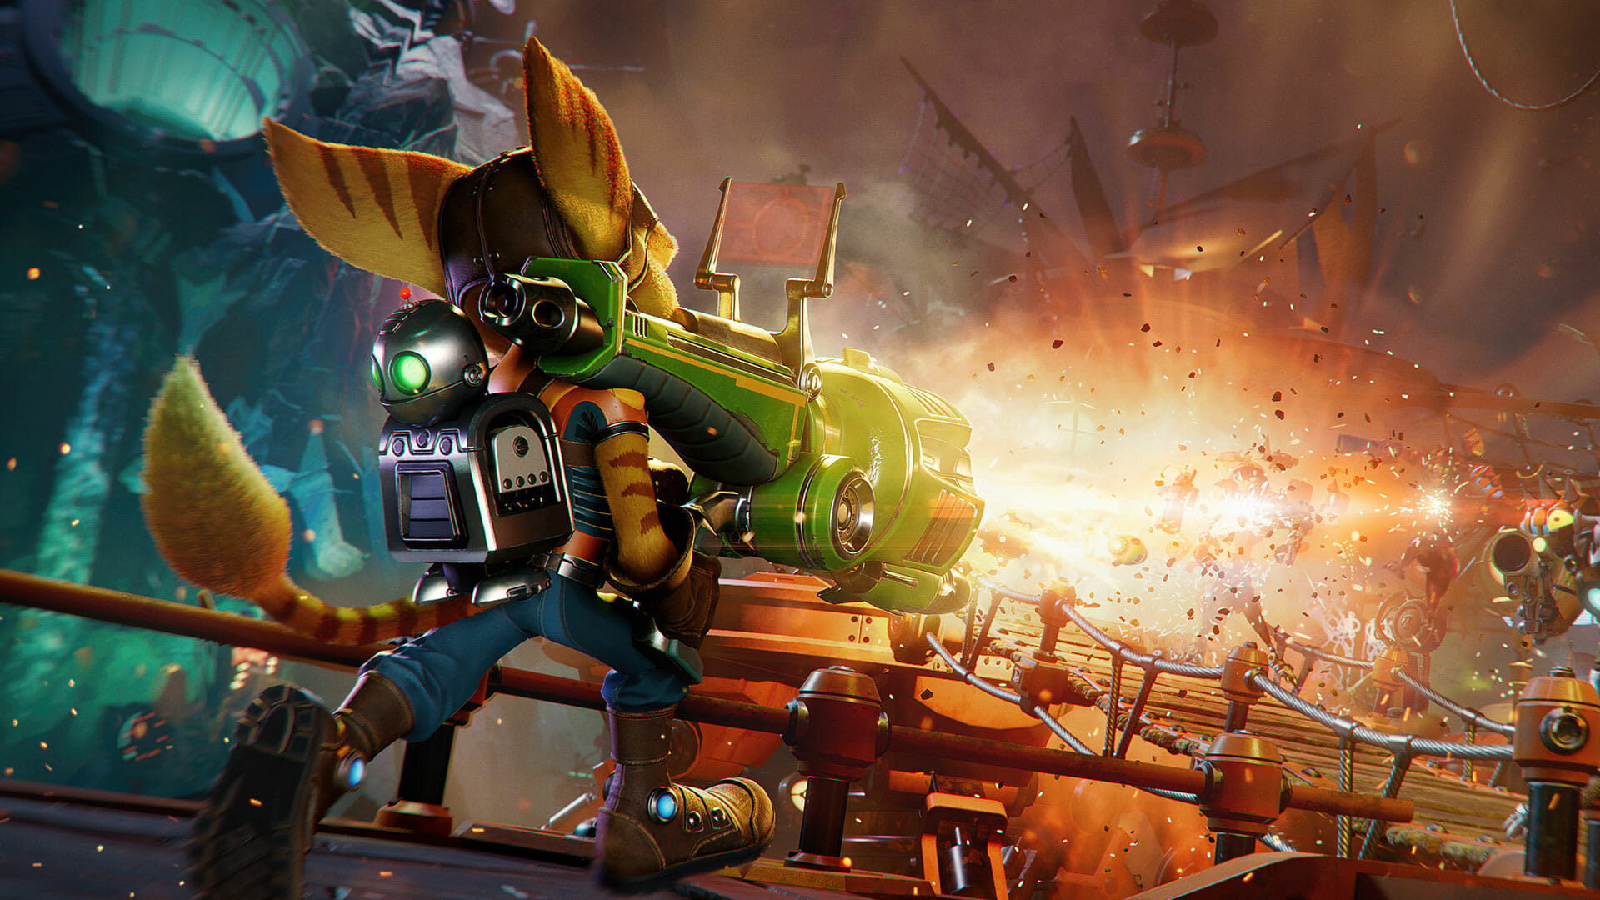 Ratchet & Clank: Rift Apart (PS5) Review 1